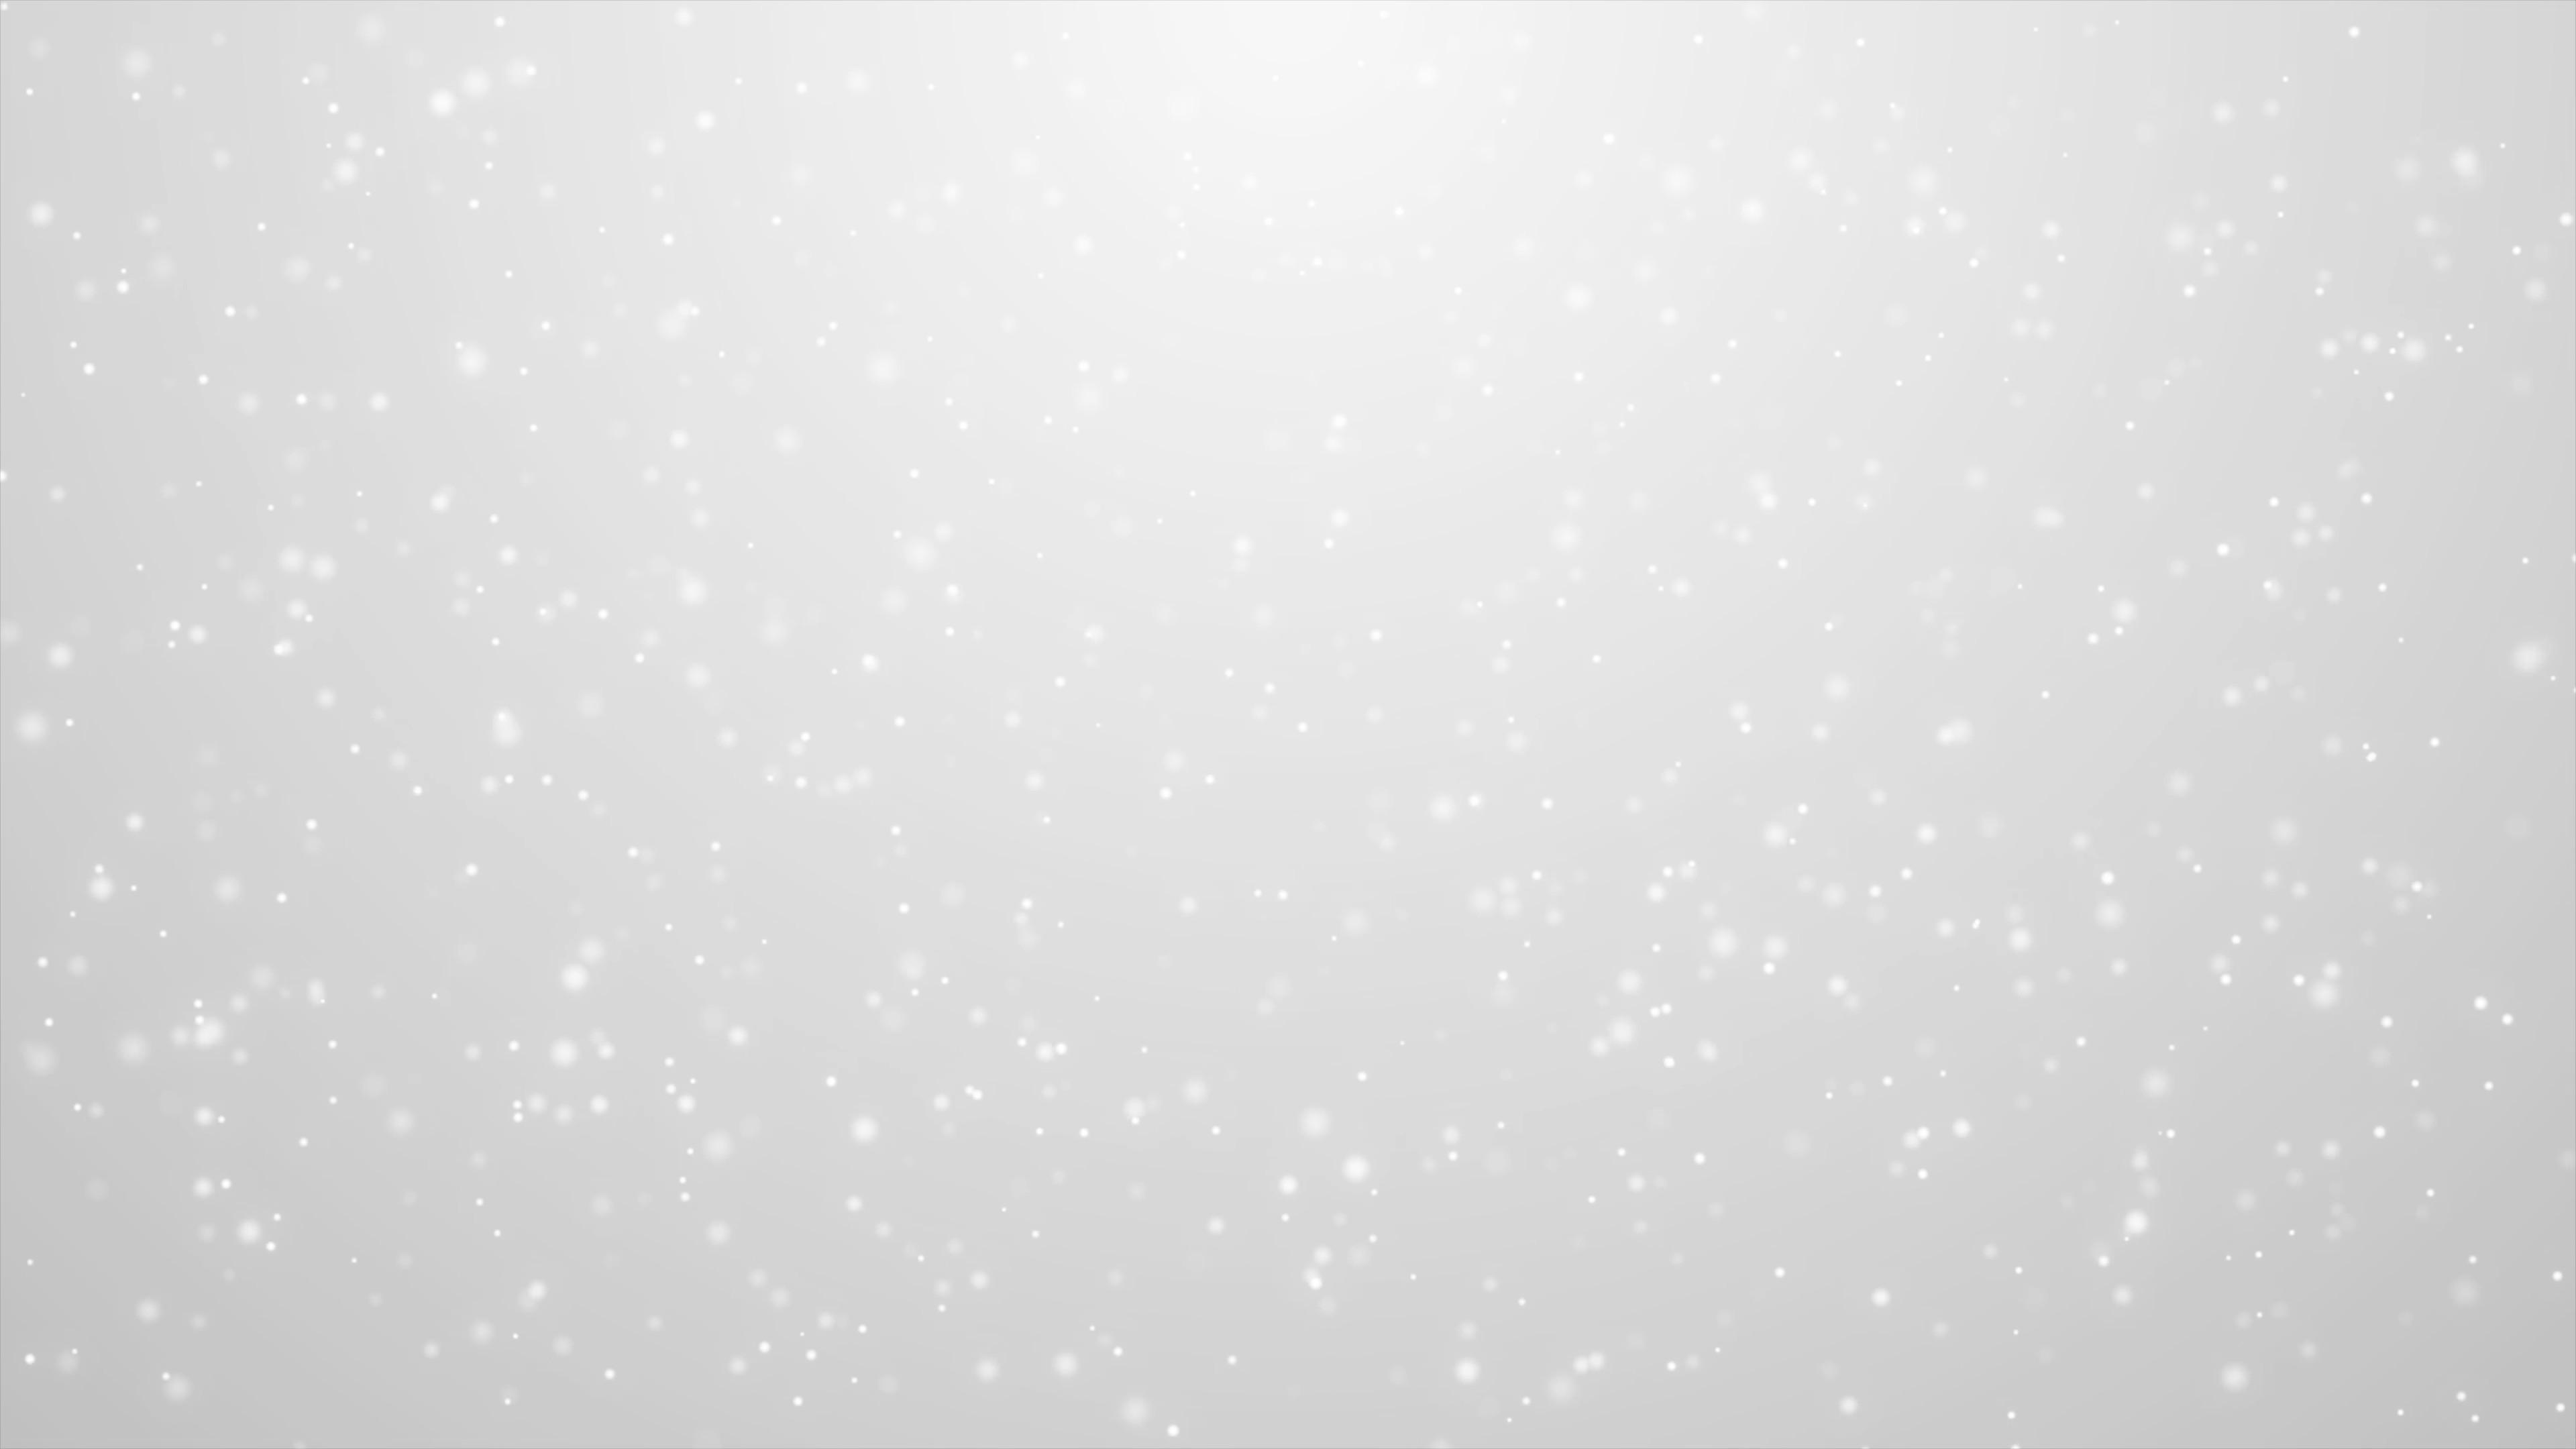 Grey White Yellow Kitchen Glitter Background Images 183 ①